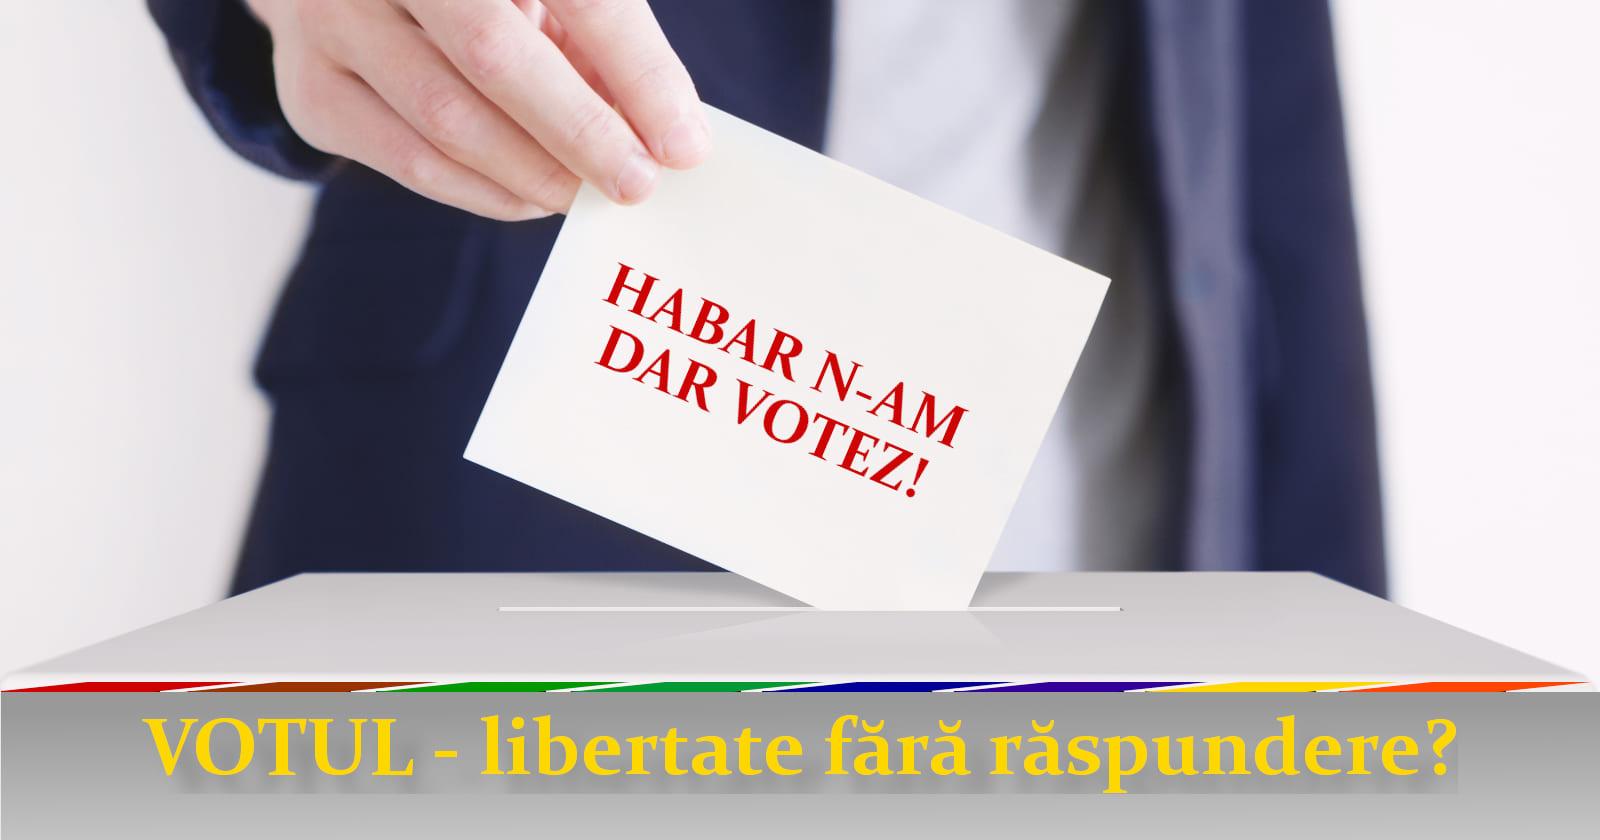 https://ziarul.romania-rationala.ro/control/articole/articole/votul-libertate-fara-raspundere.jpg